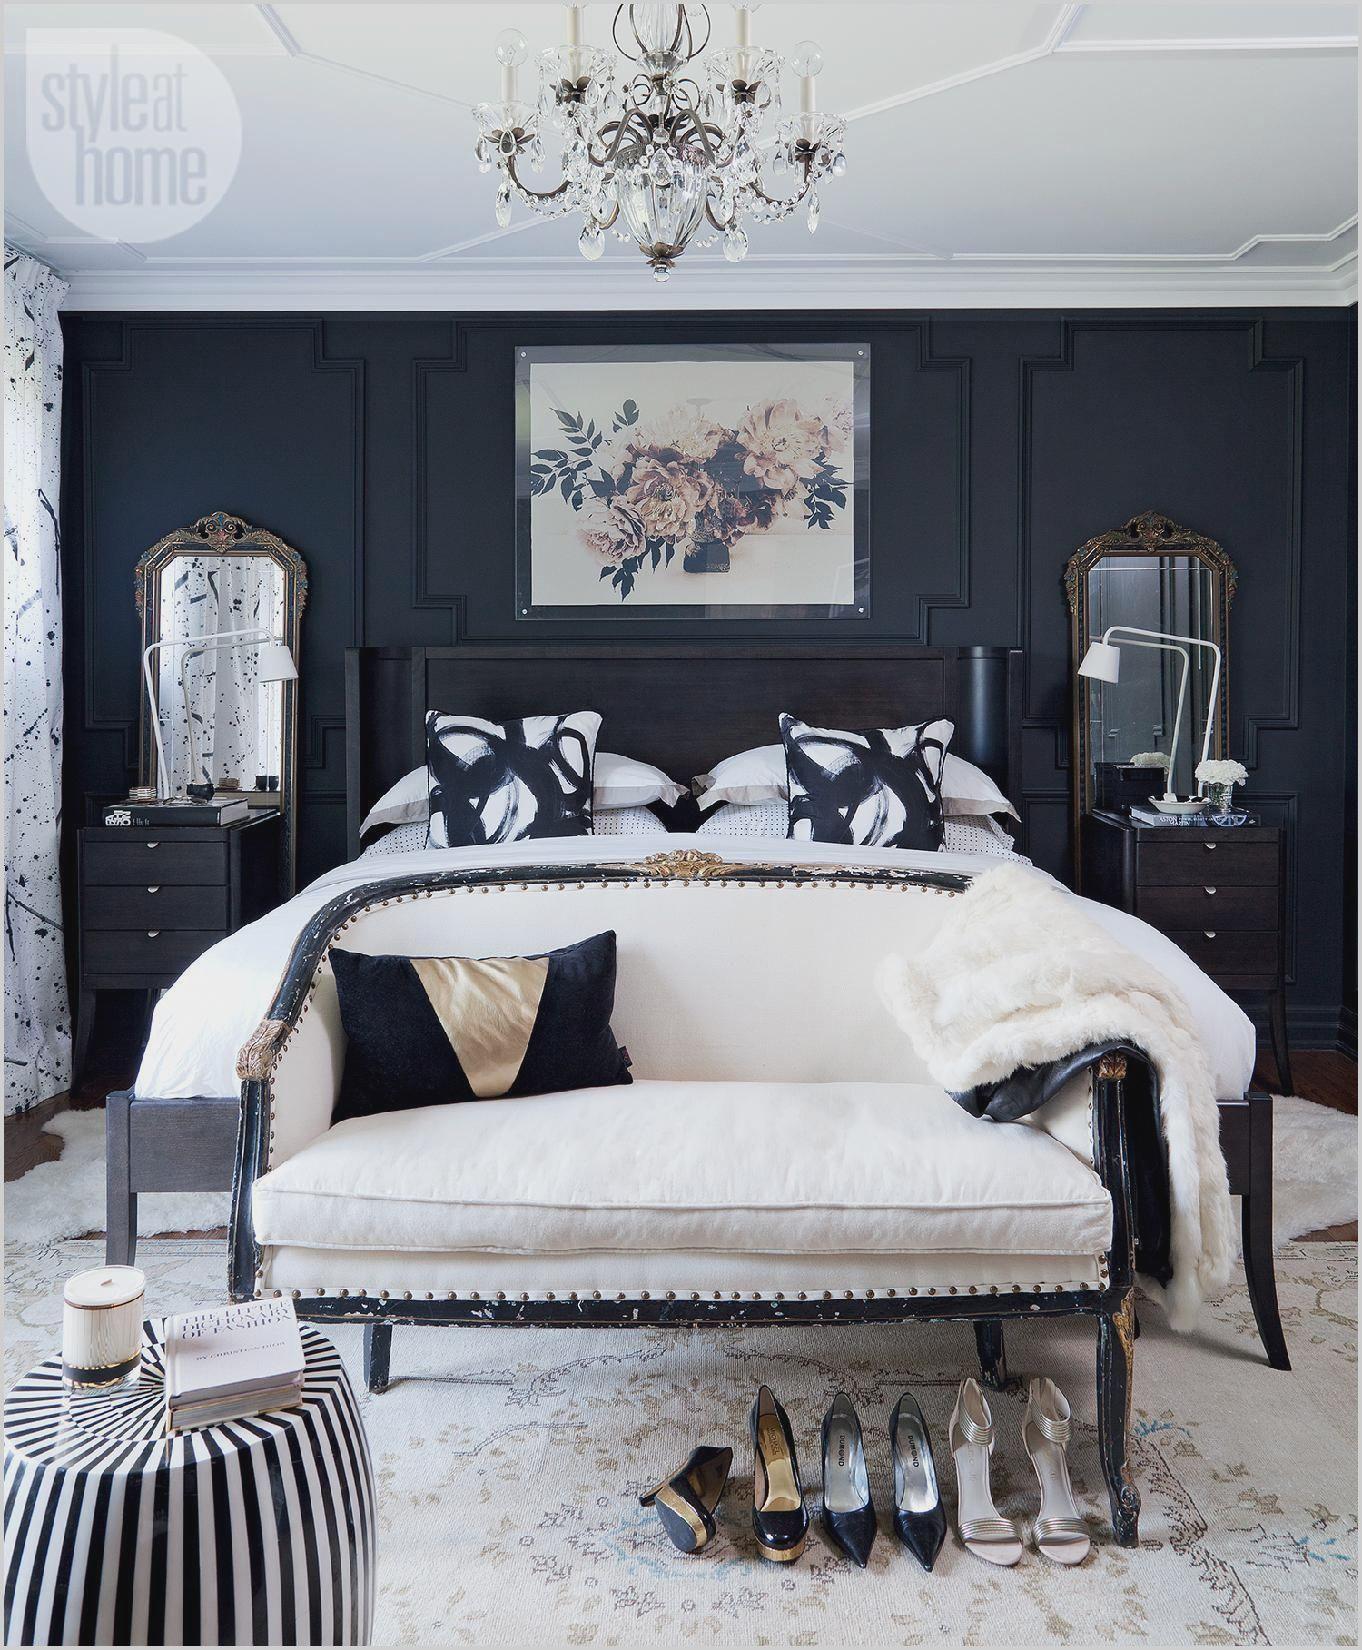 Bedroom Interior Ideas 2014 White Bedroom Decor White Master Bedroom Master Bedroom Furniture